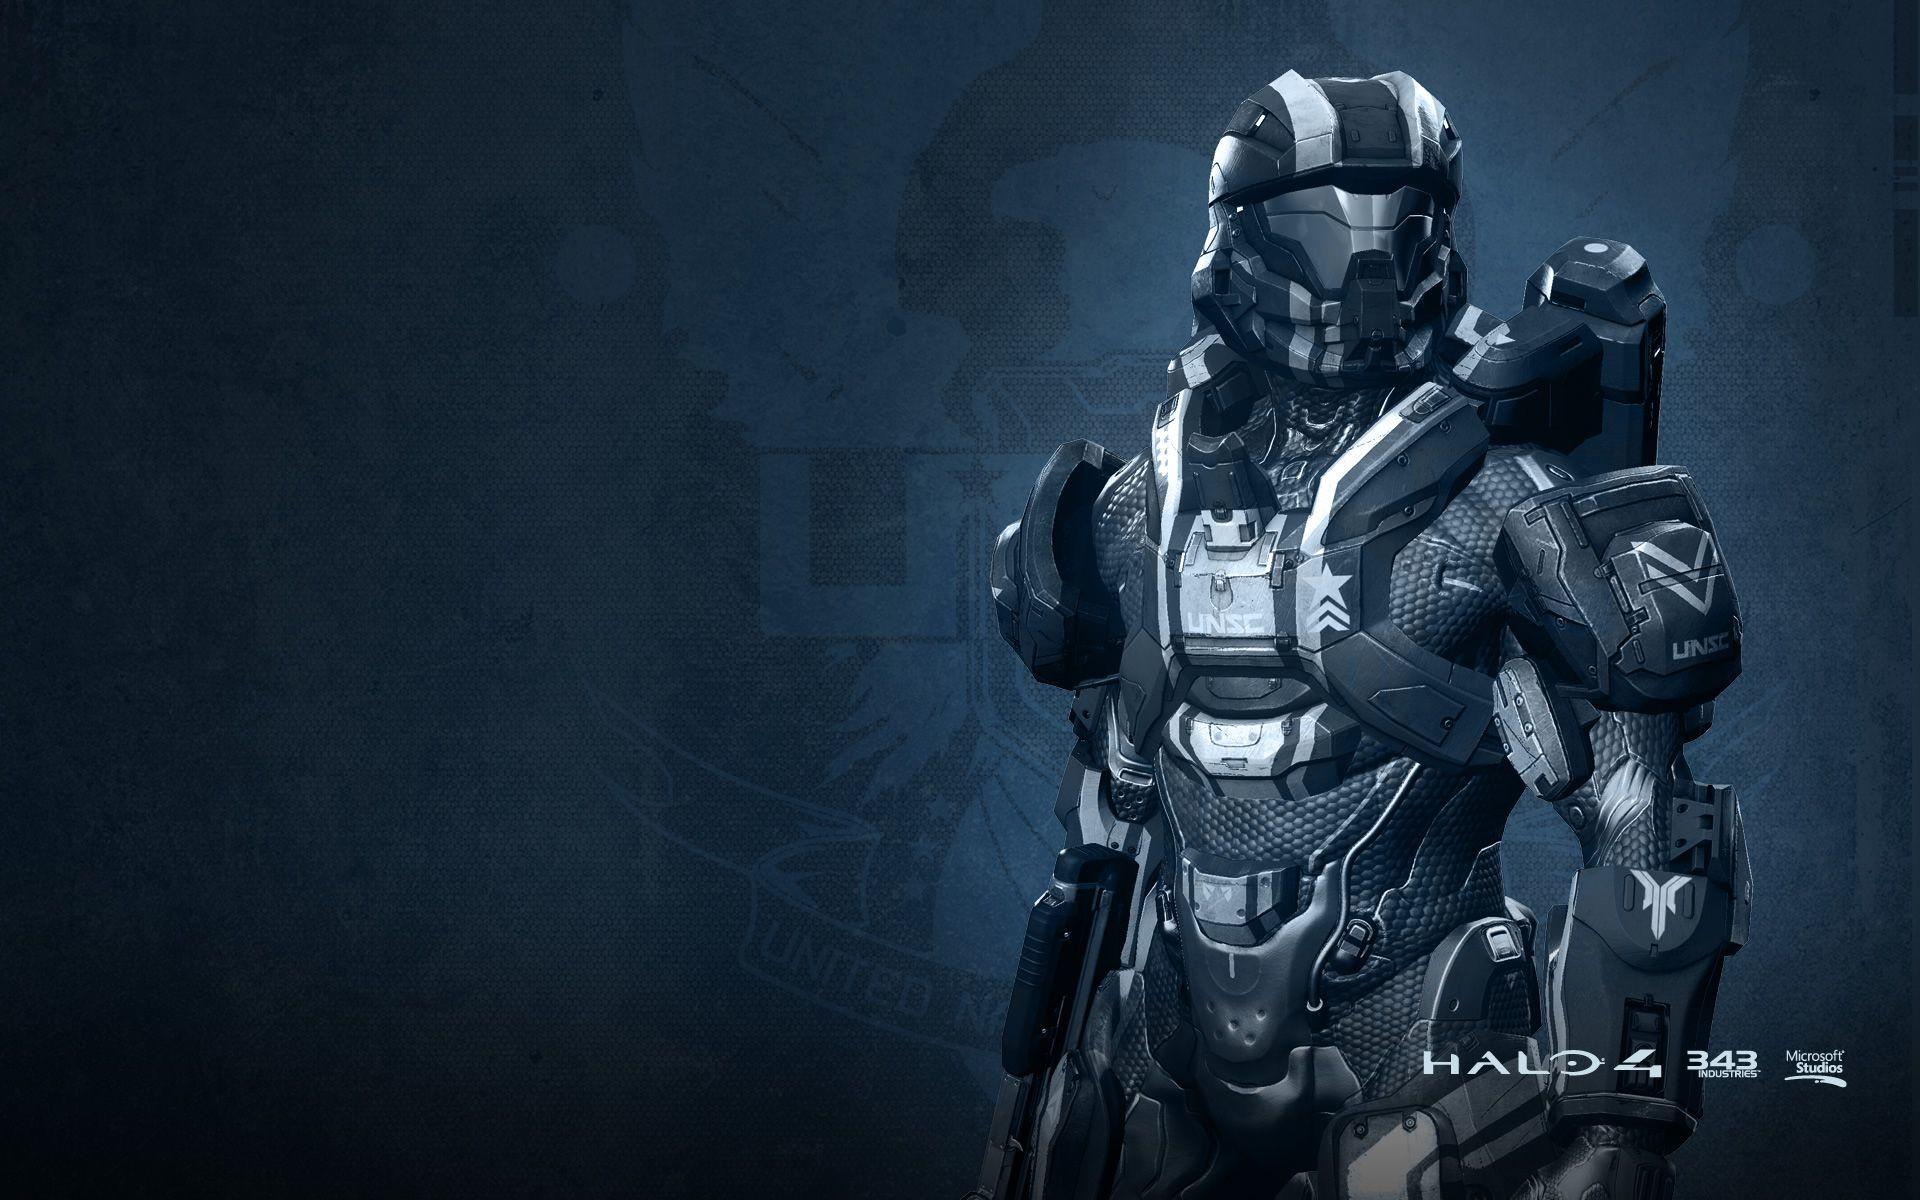 Halo 4 Spartan Ops wallpaper 198193 · IMAGE